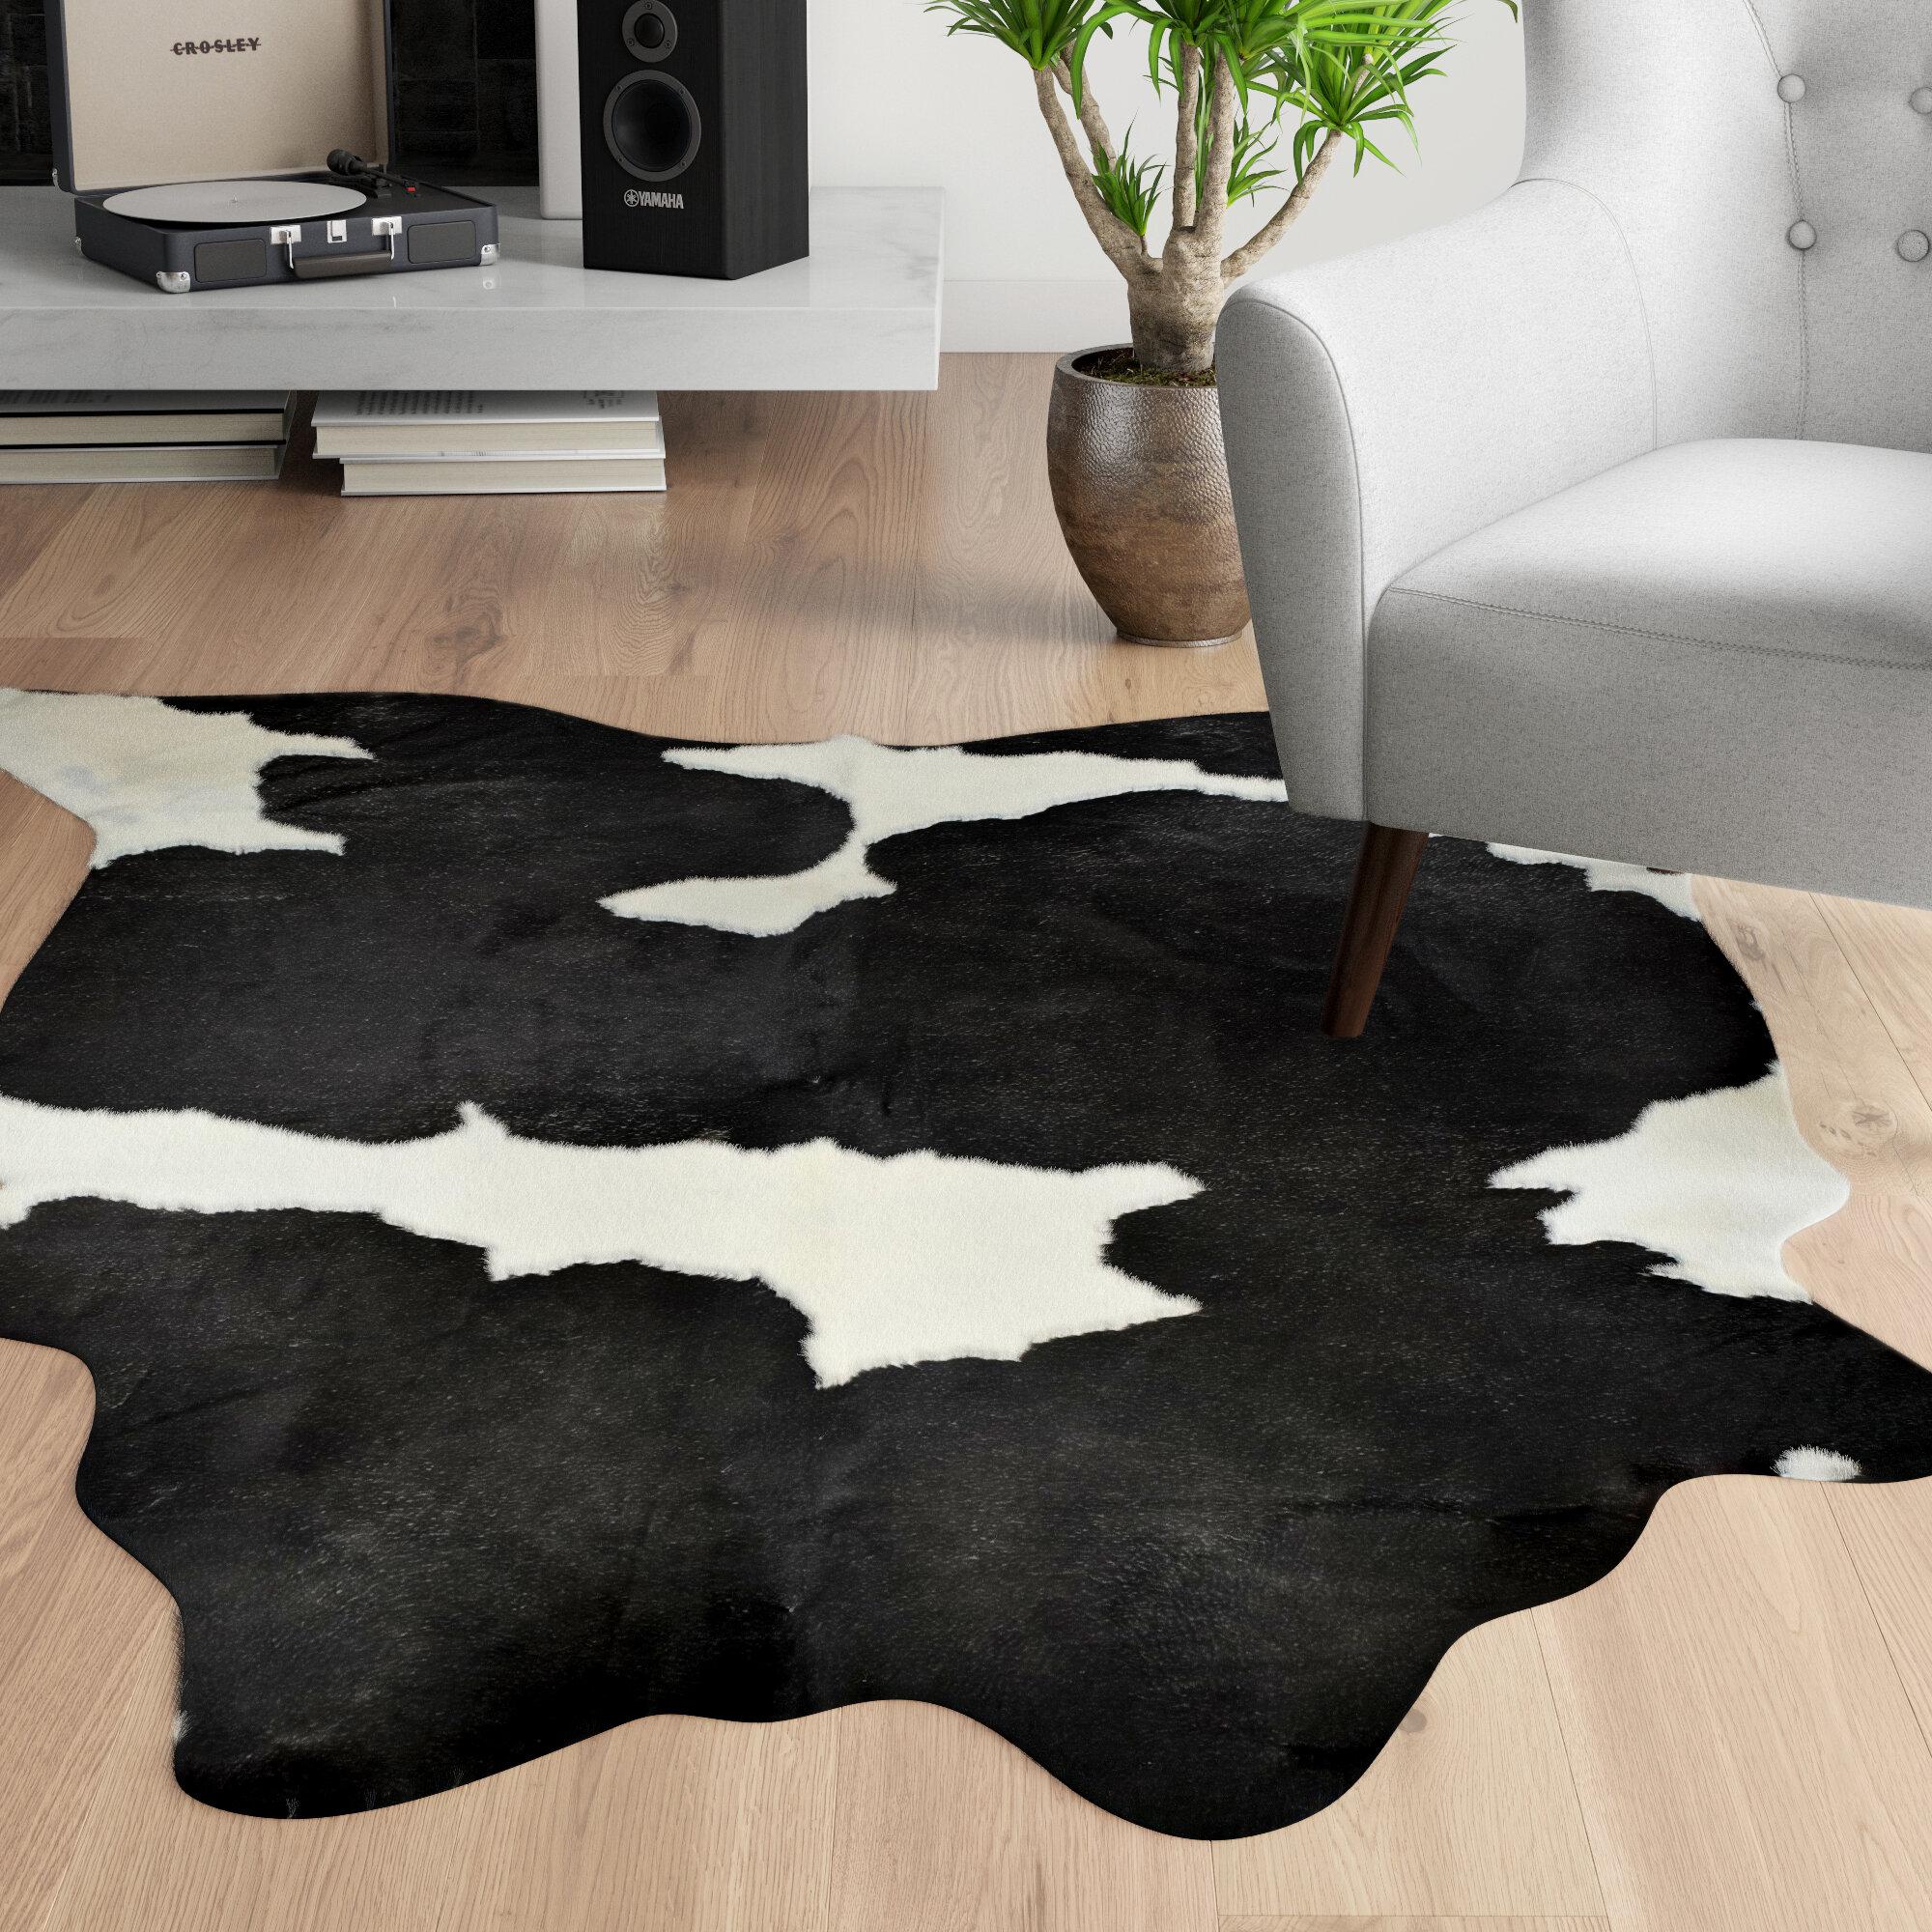 Bert Handmade Cowhide Black White Area